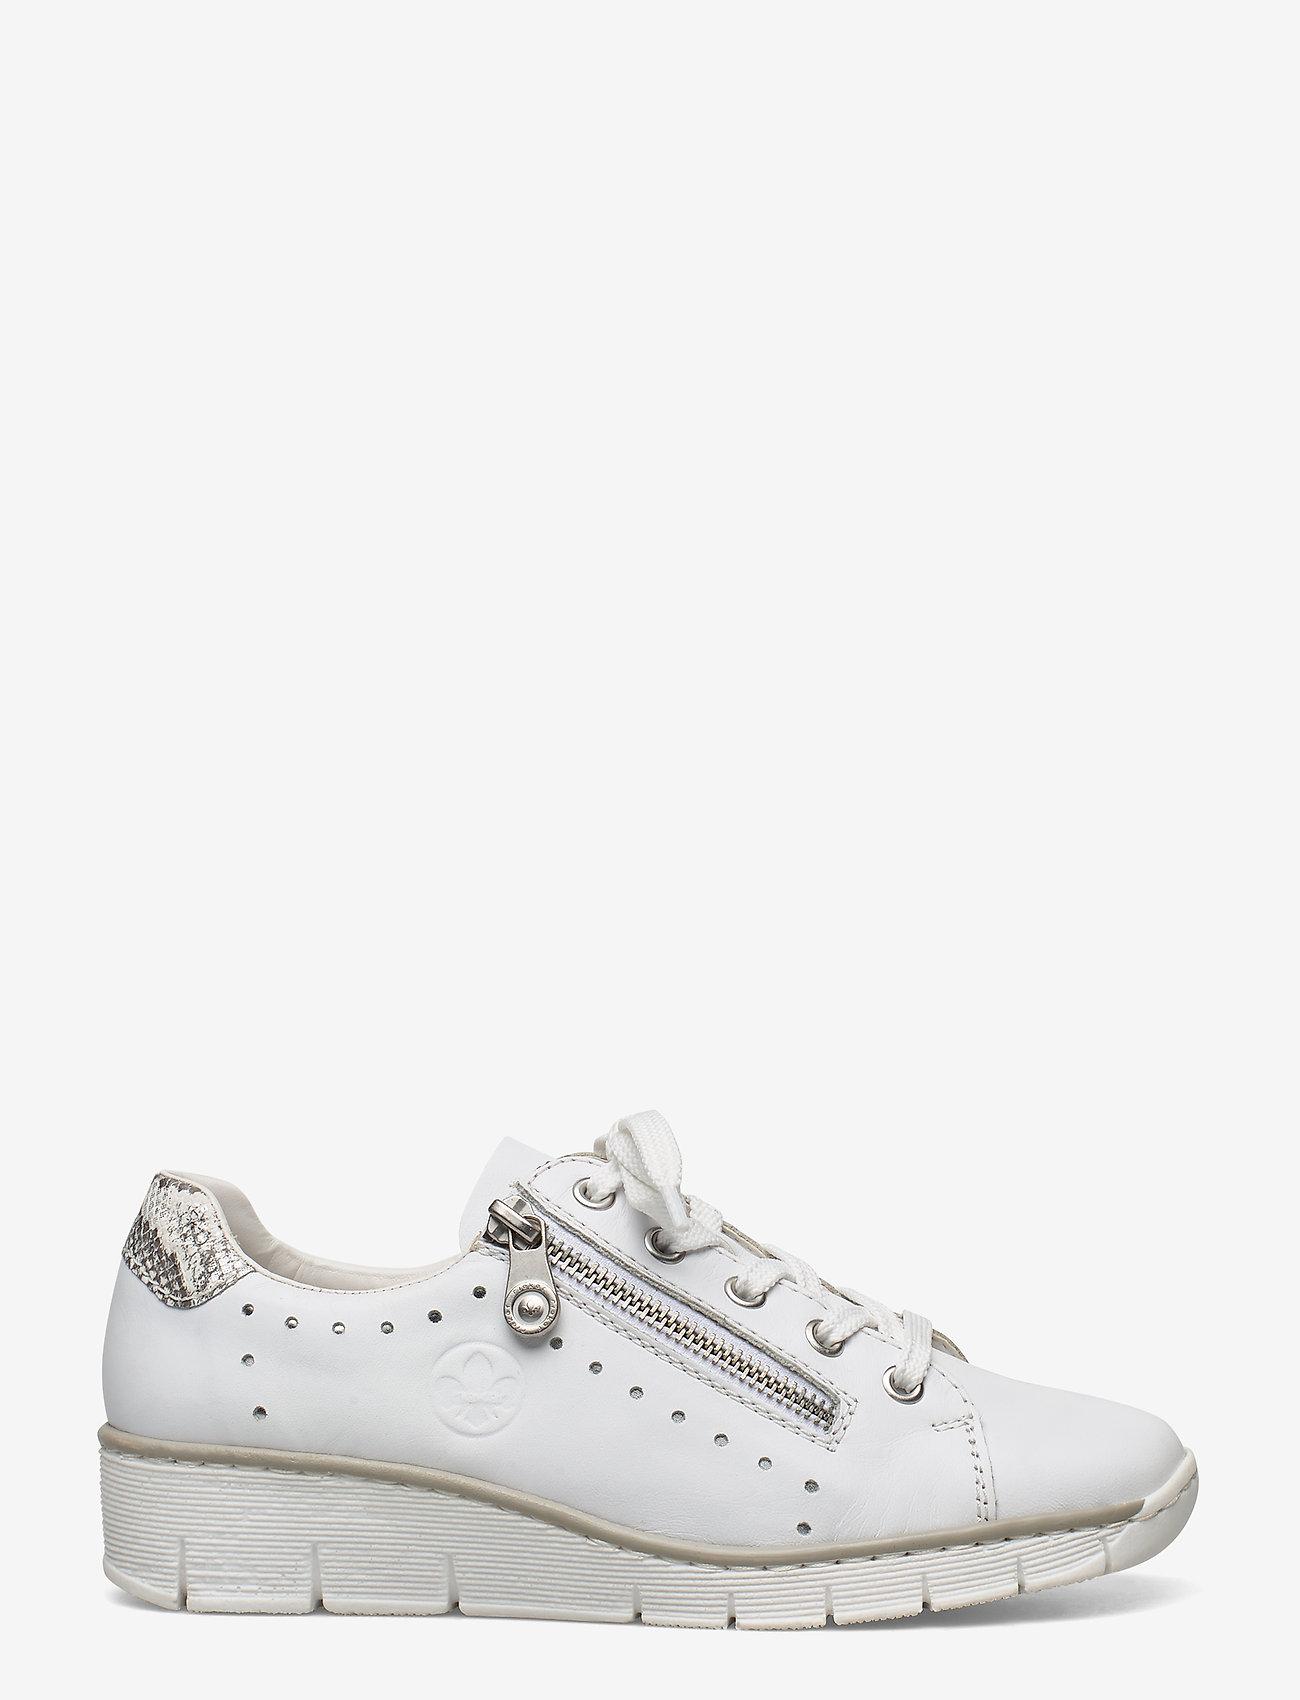 Rieker - 53701-80 - low top sneakers - weiss